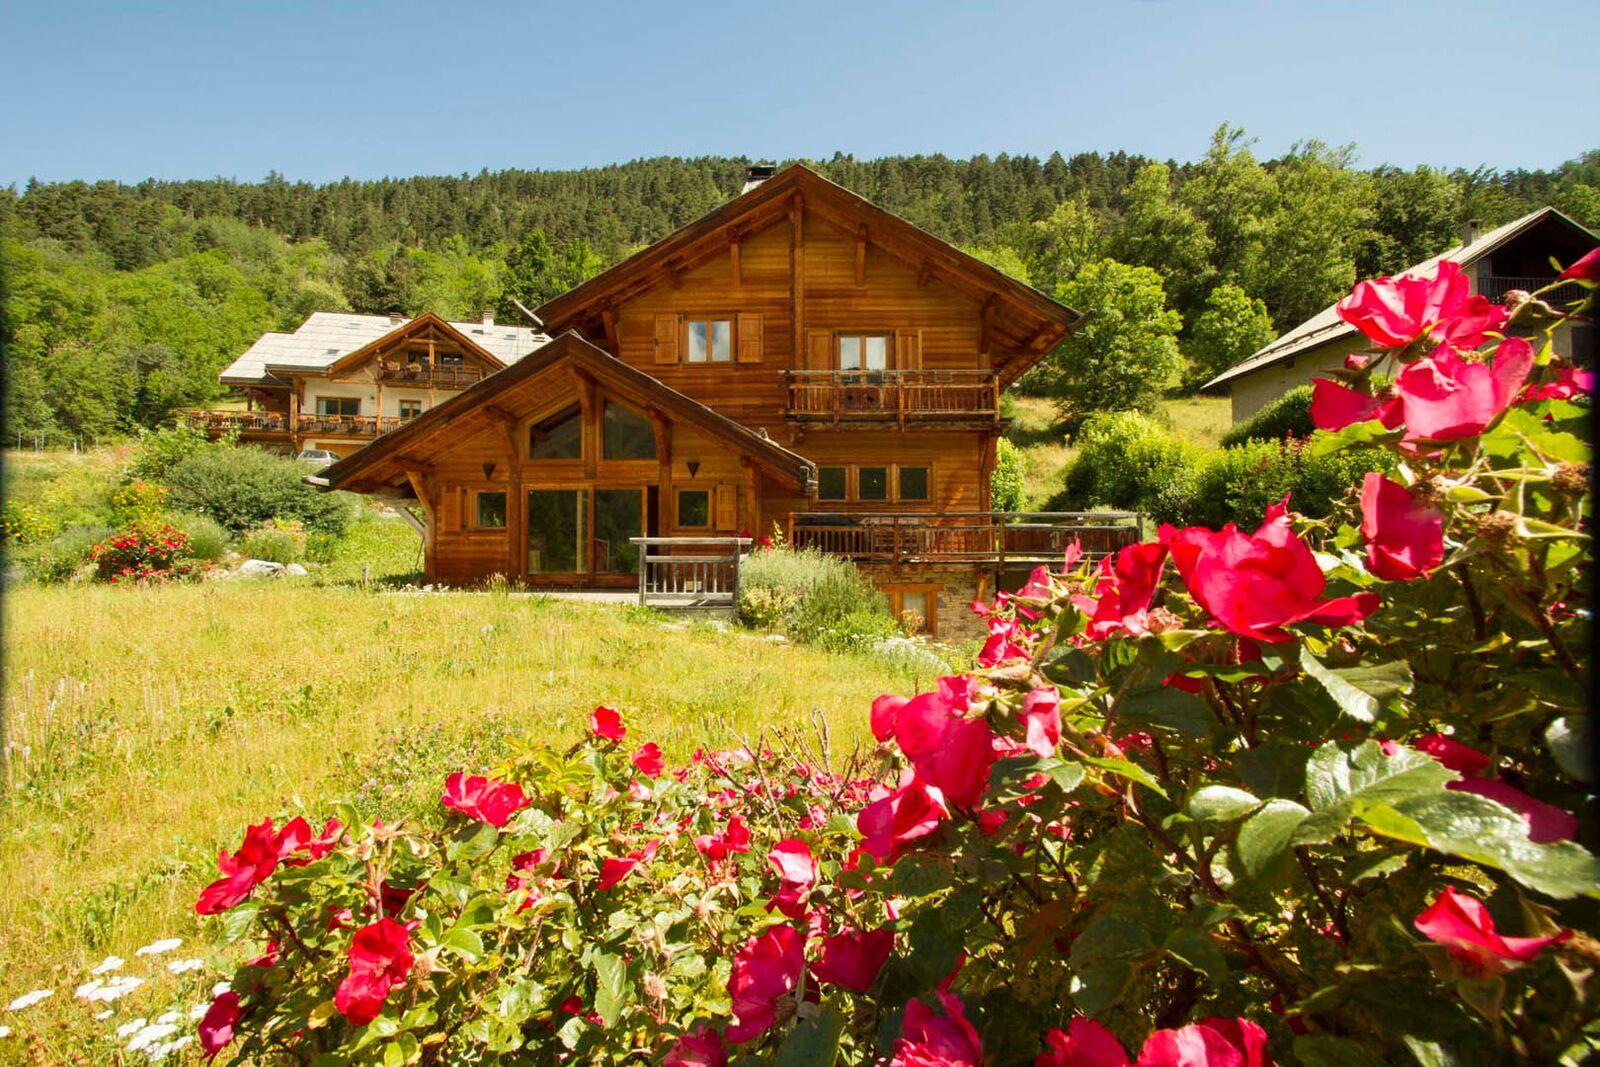 Serre Chevalier Luxury Chalet Rentals ski slopes spa concierge ...